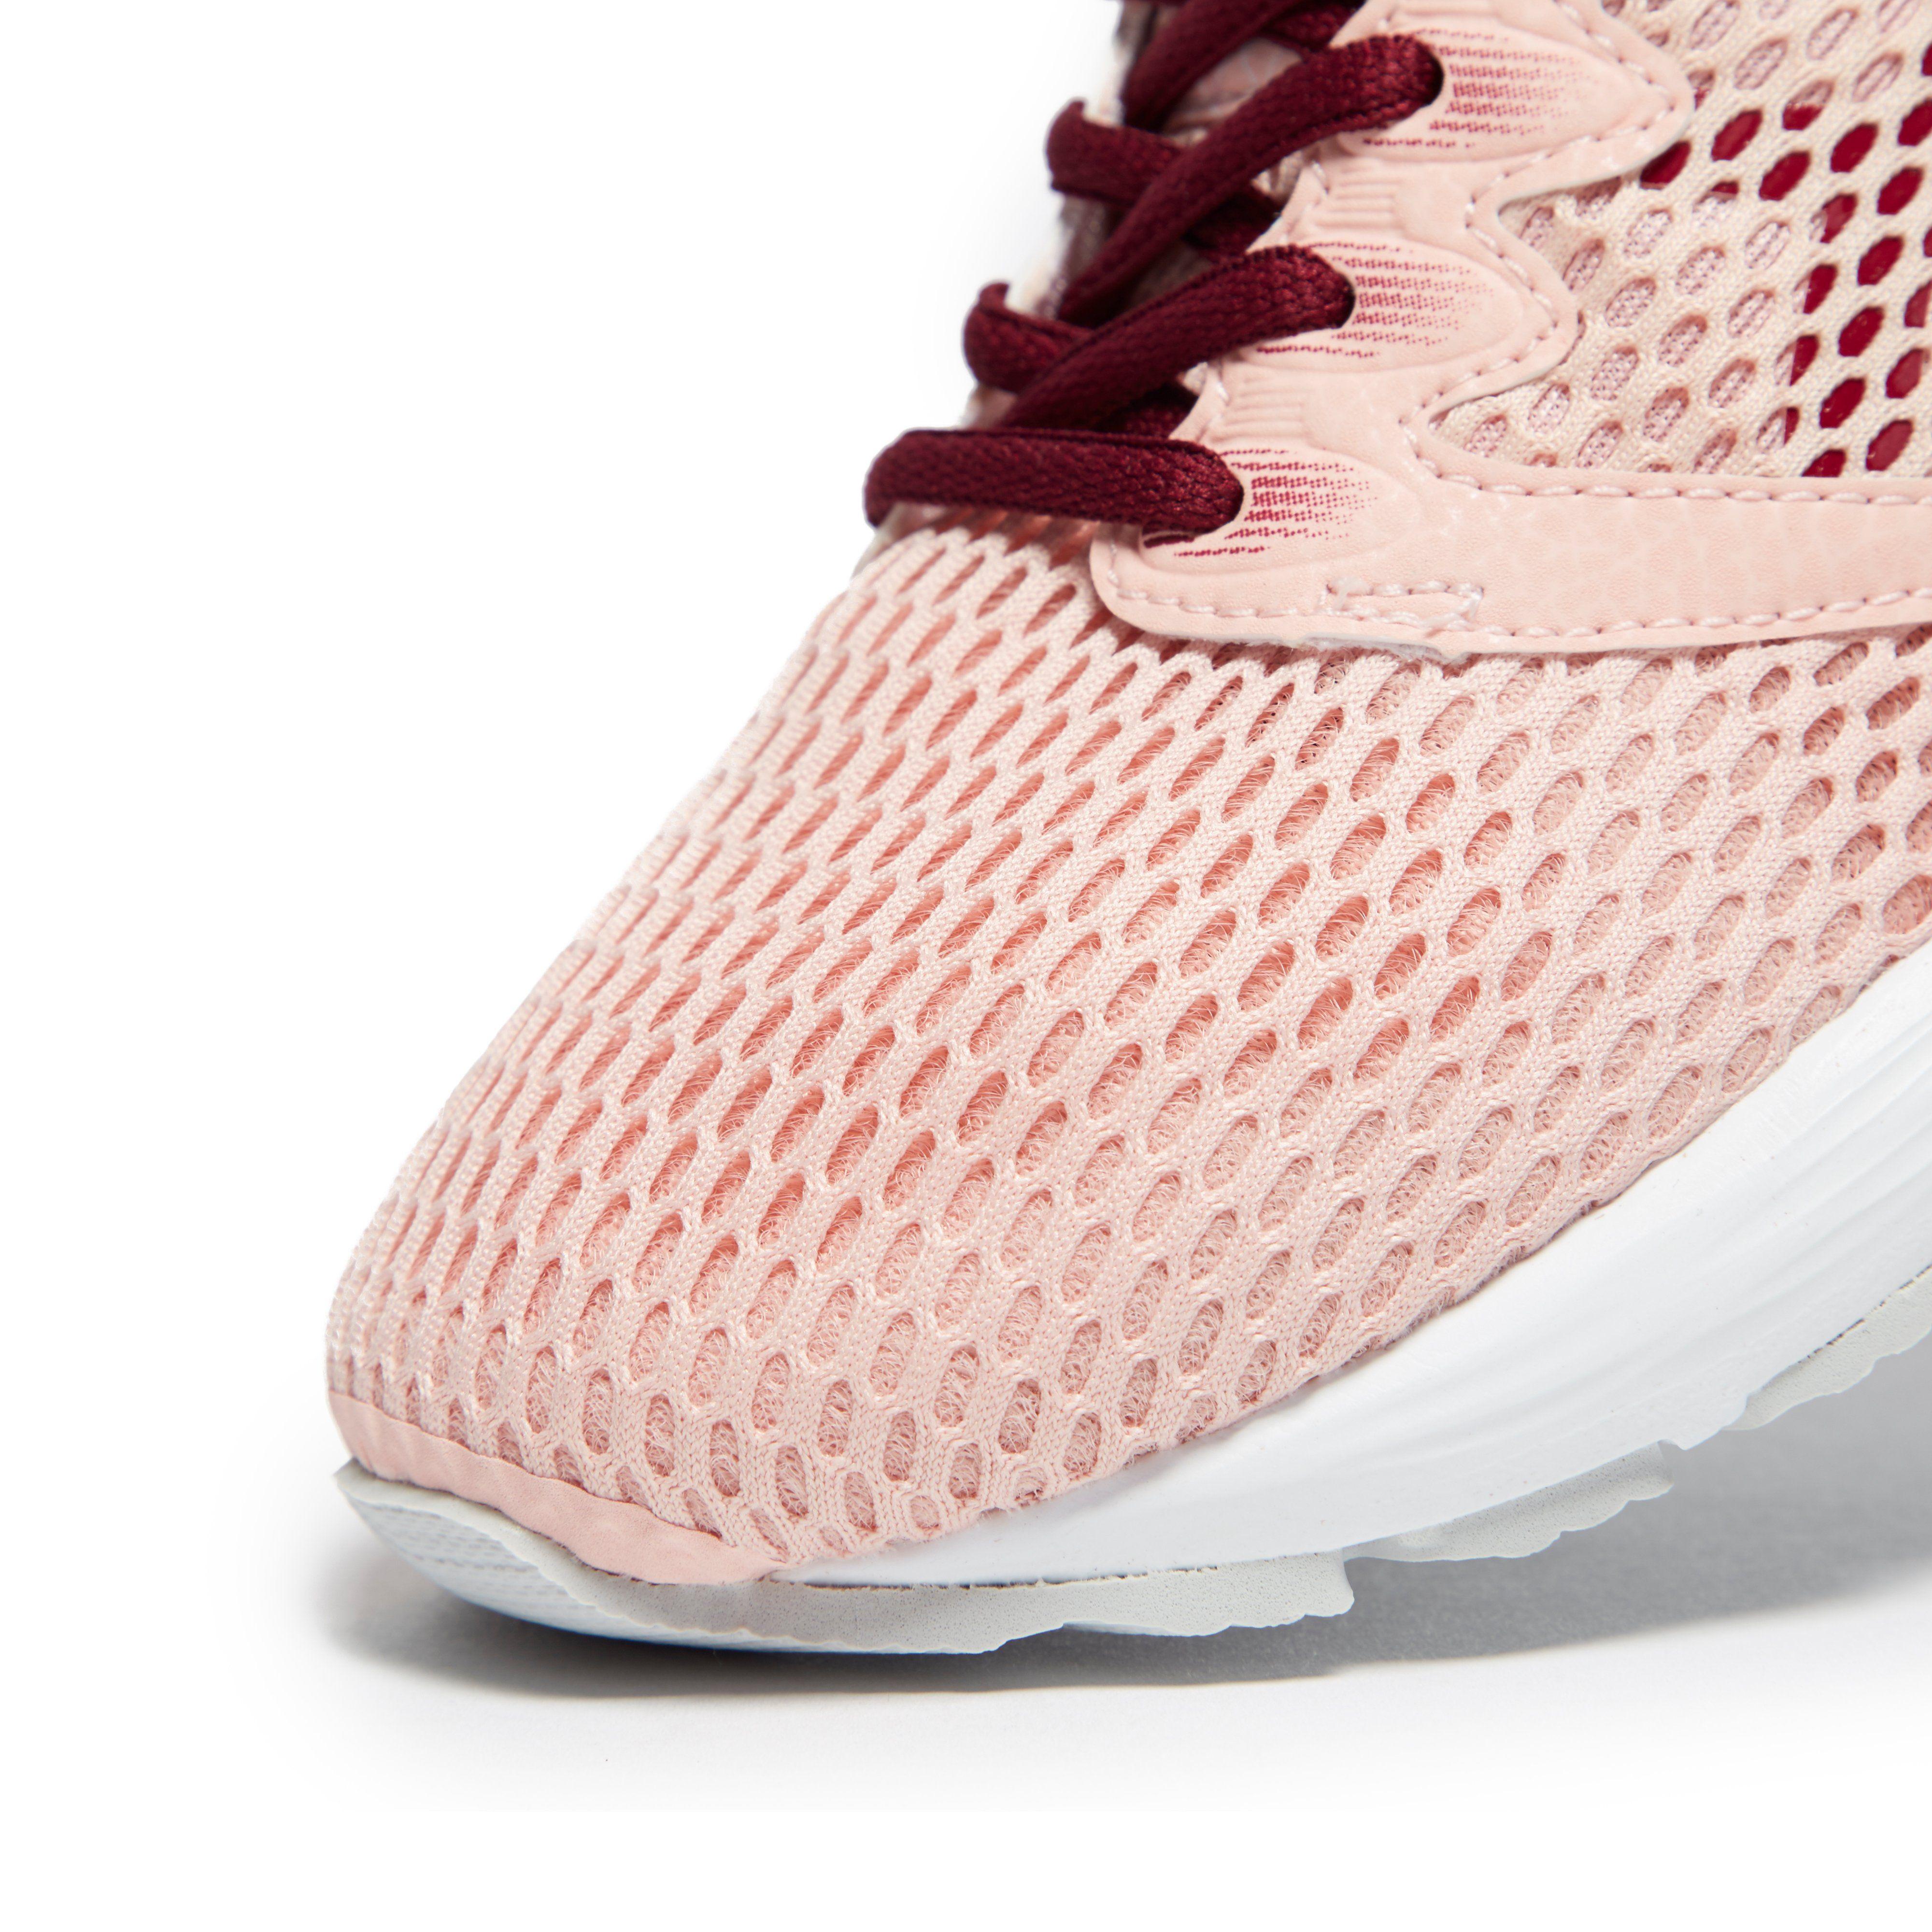 ASICS RoadHawk FF 2 Women's Running Shoes